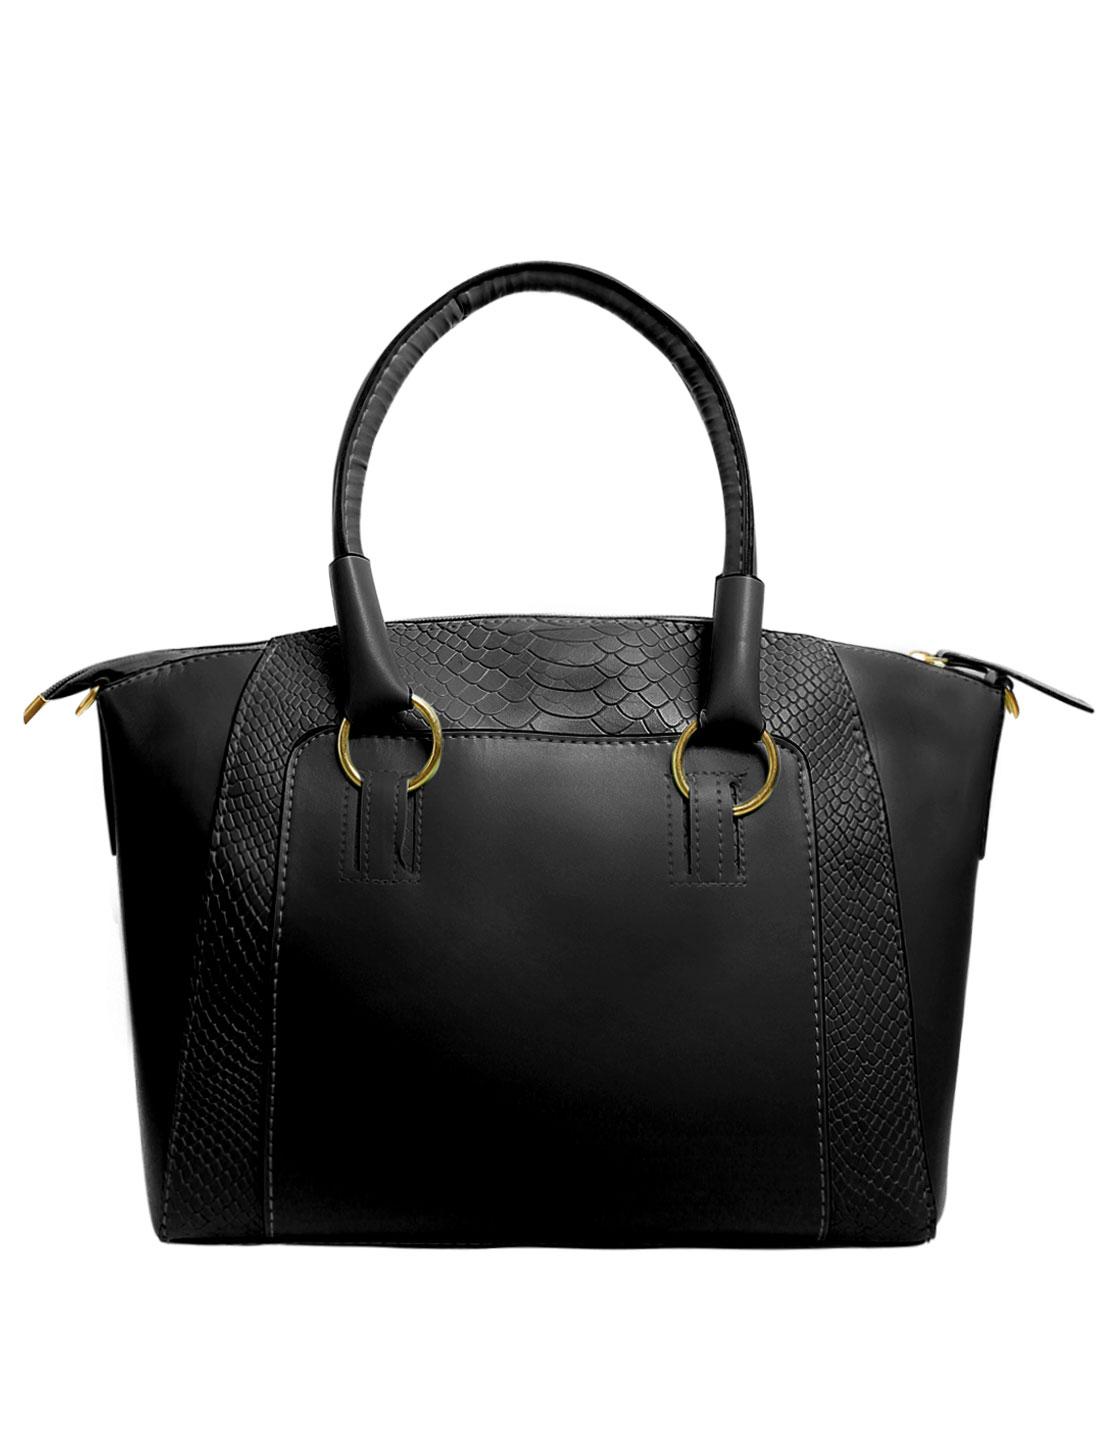 Women Faux Leather Handbag Messenger Tote Cross Body Shoulder Bag Crocodile Print Black